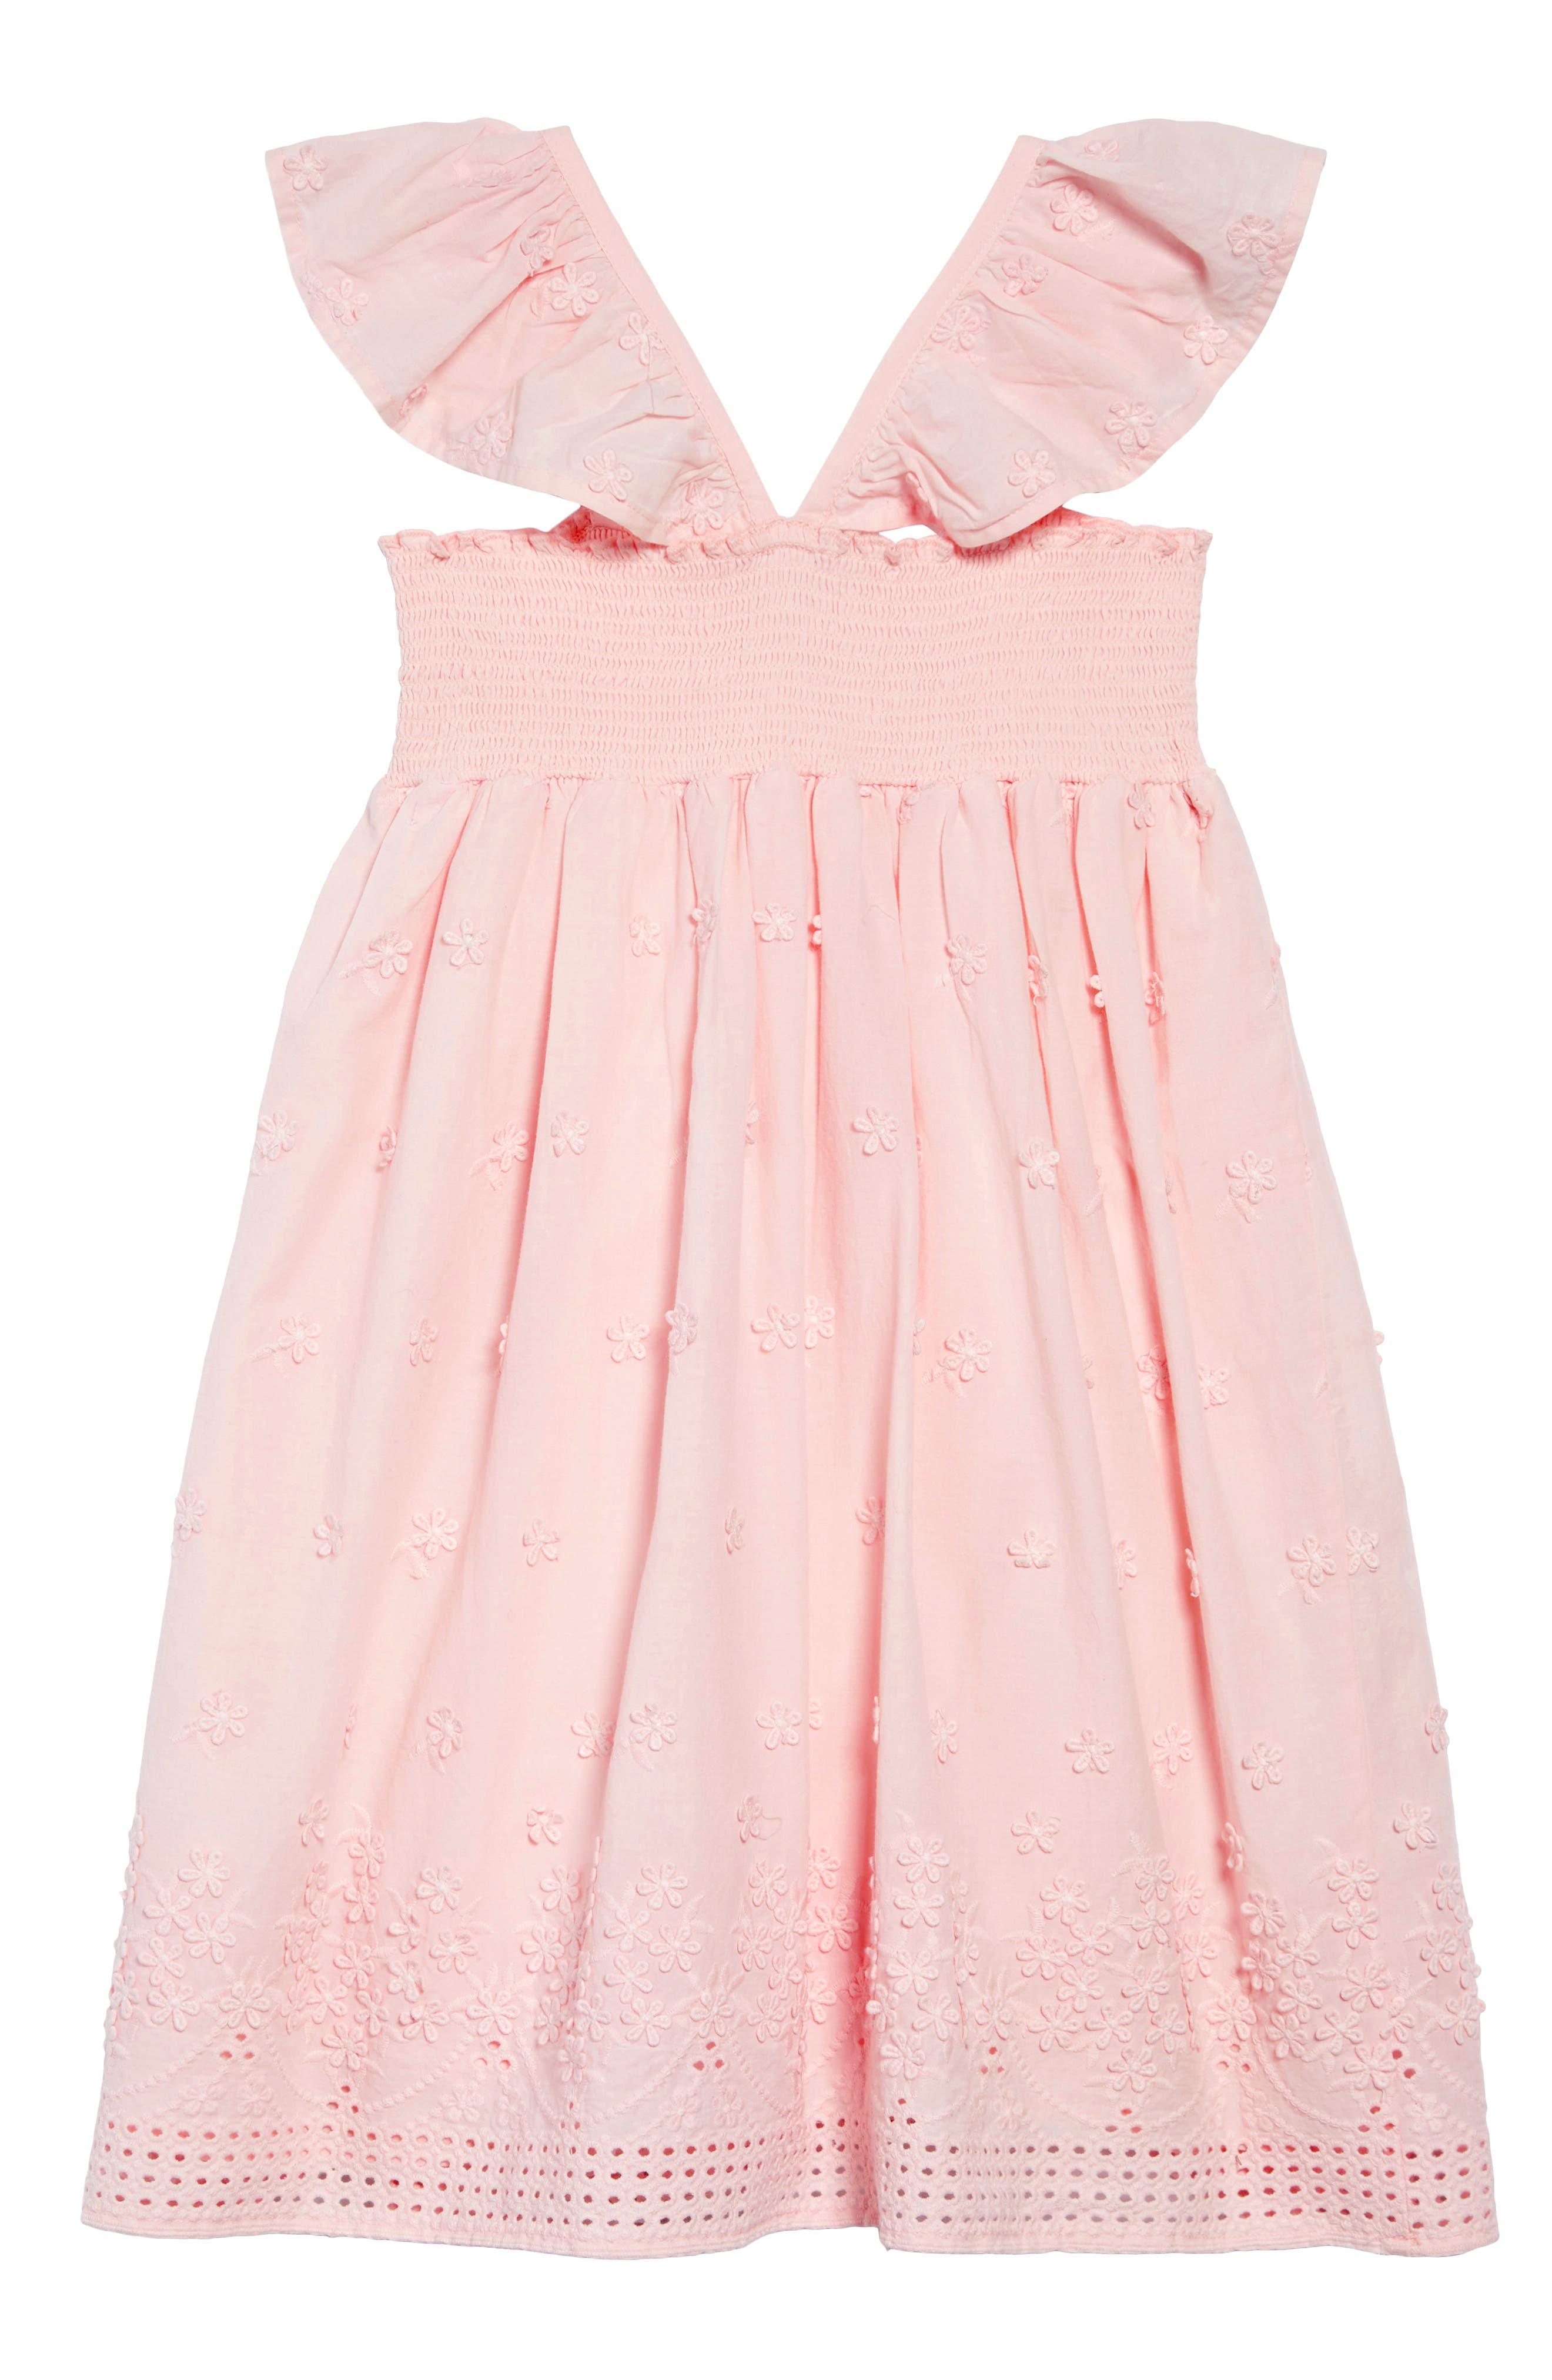 RUBY & BLOOM,                             Flutter Sleeve Dress,                             Alternate thumbnail 2, color,                             PINK CHINTZ